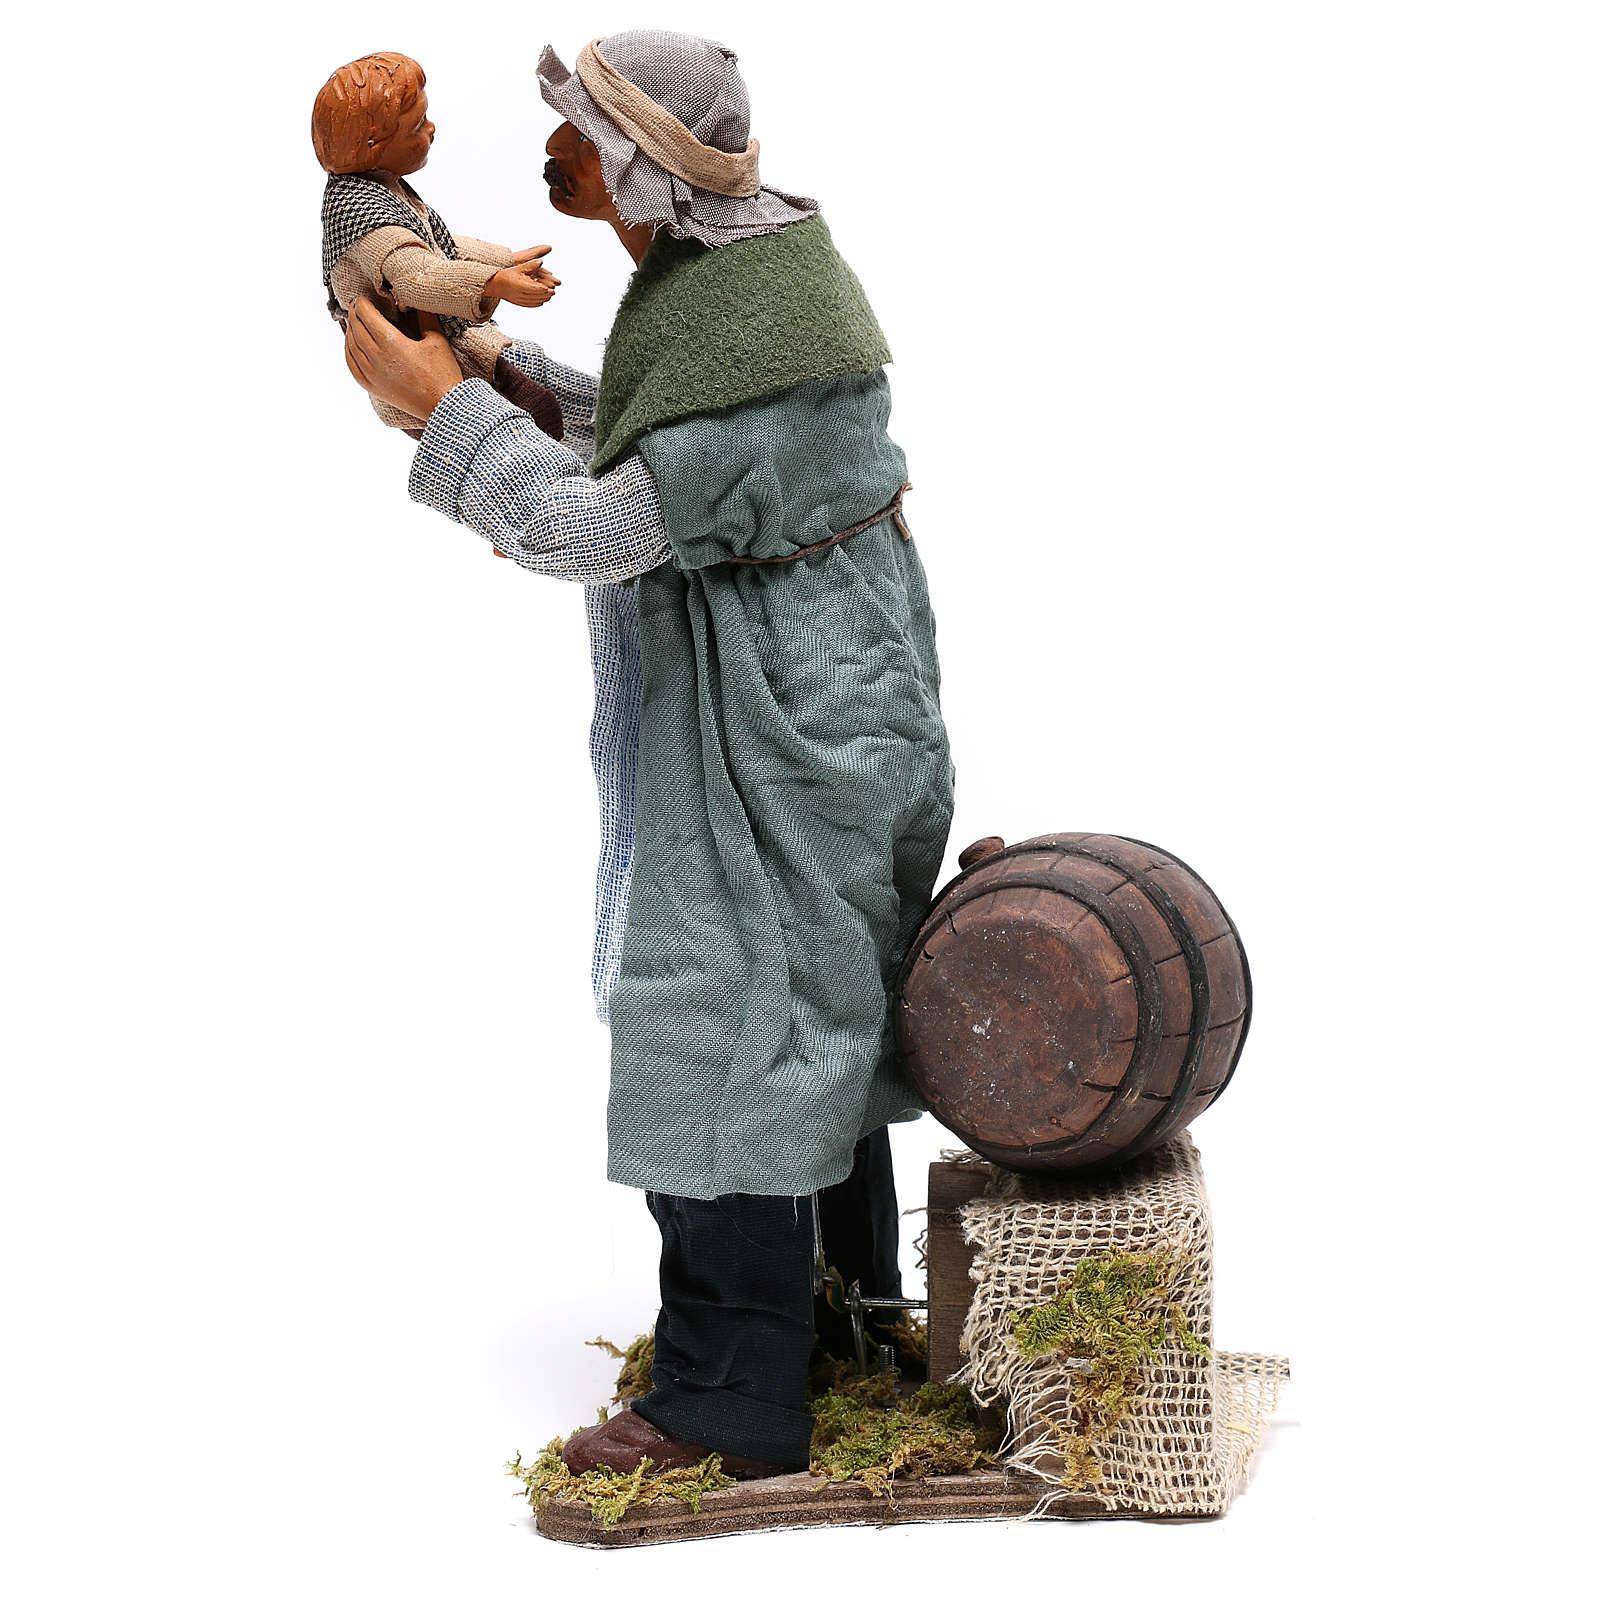 Man lifting child 24 cm for Neapolitan nativity scene 4